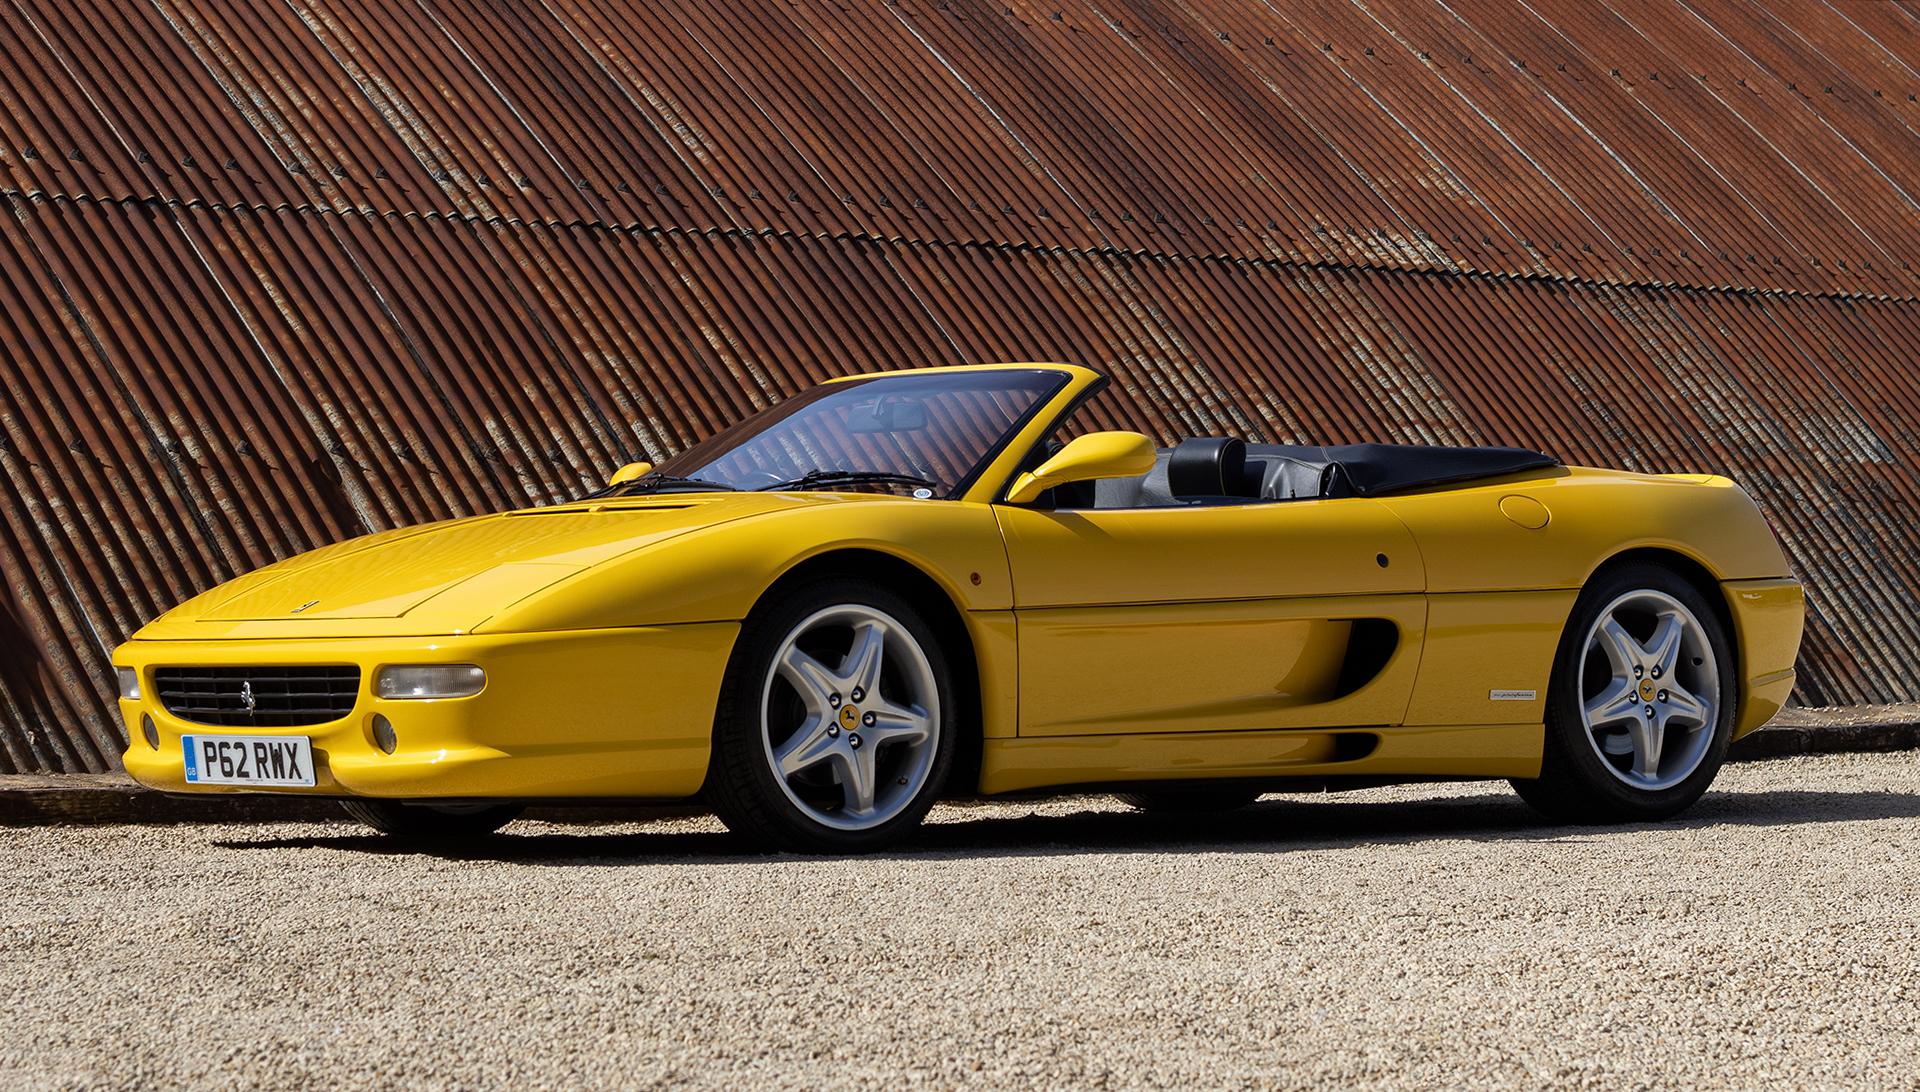 1997 Ferrari F355 Spider for sale at The Classic Motor Hub